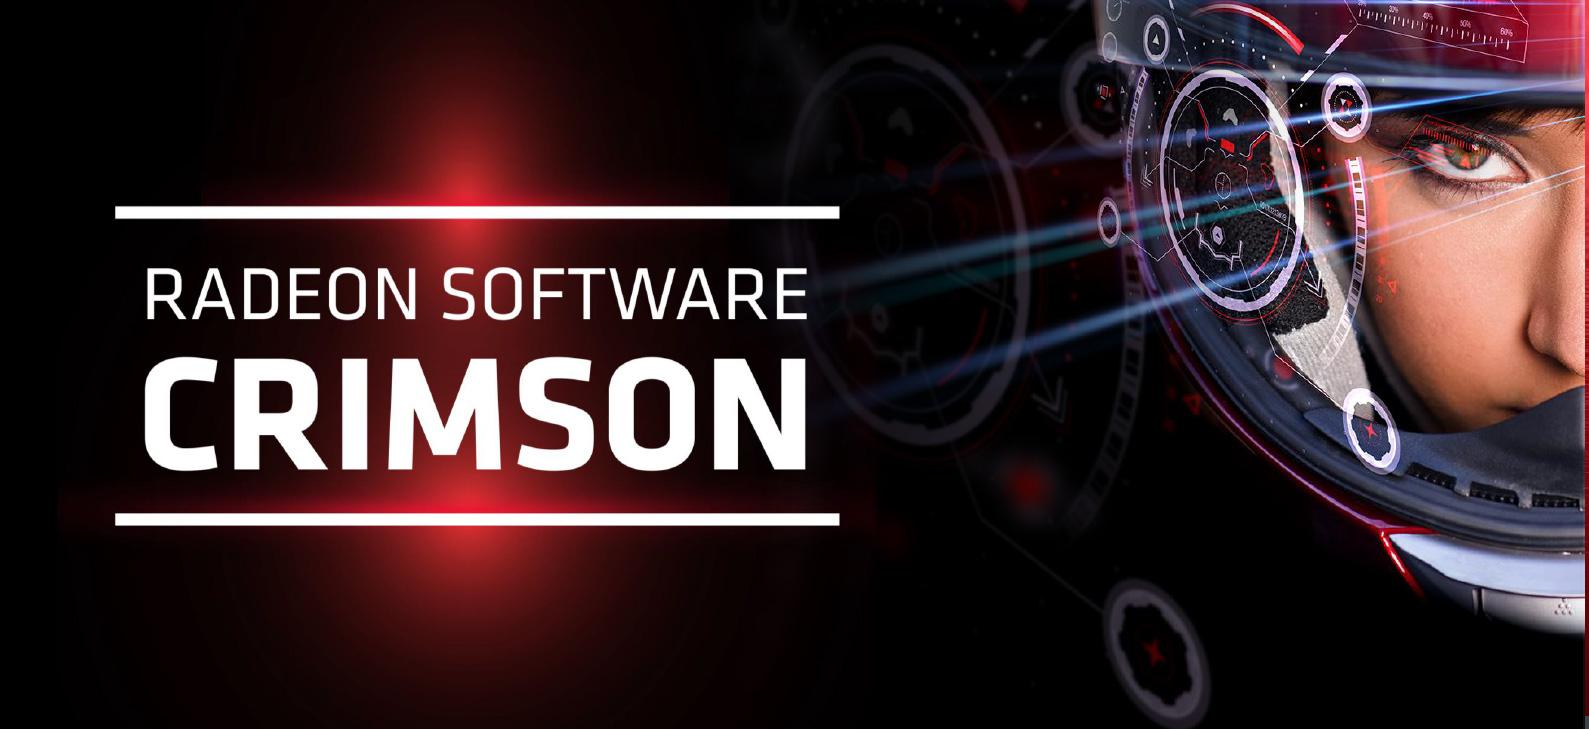 radeon software crimson 0